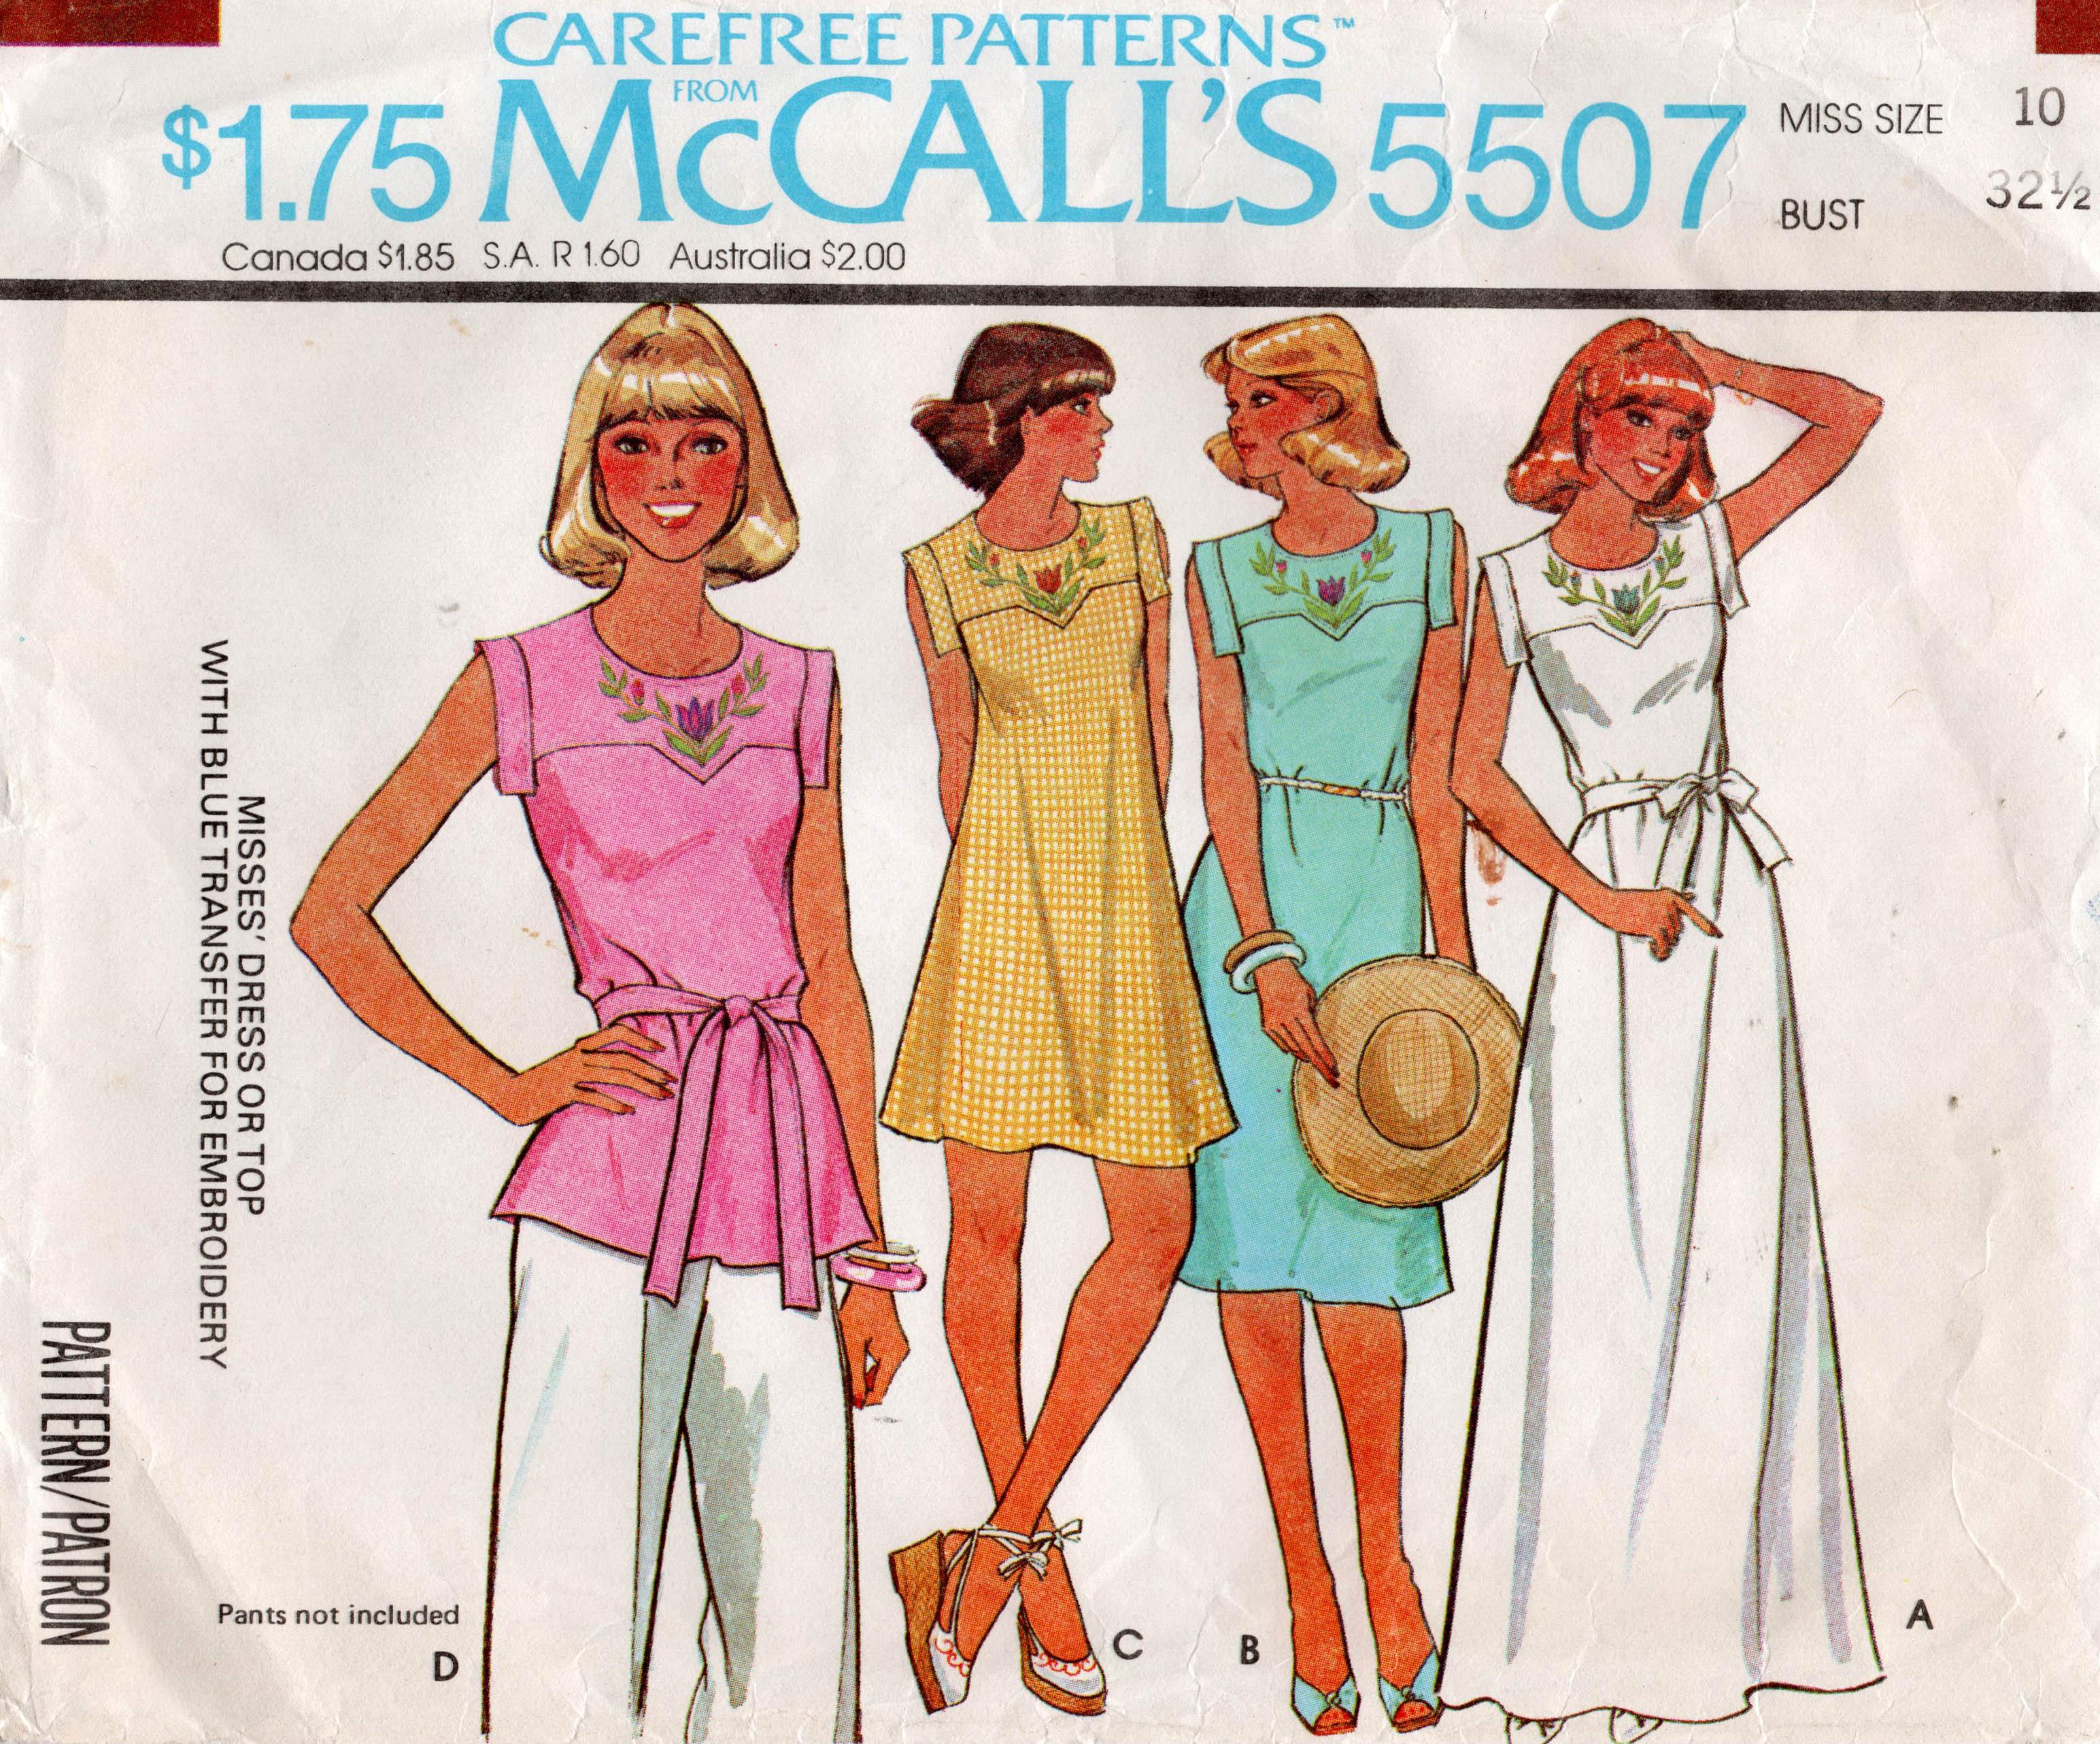 McCall's 5507 A